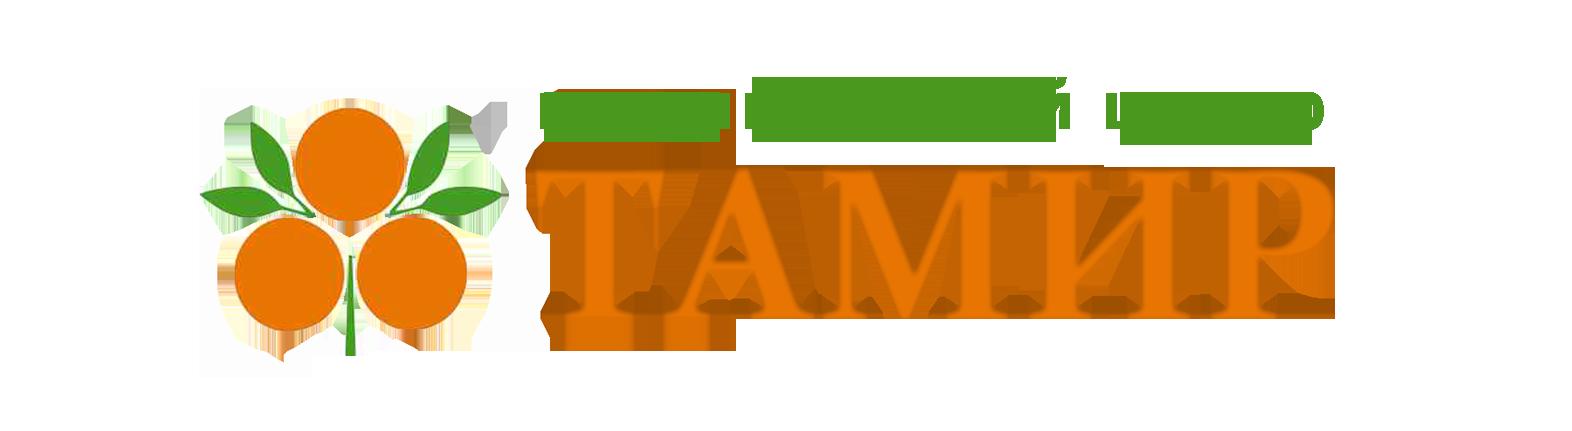 Медицинский центр Тамир в Улан-Удэ